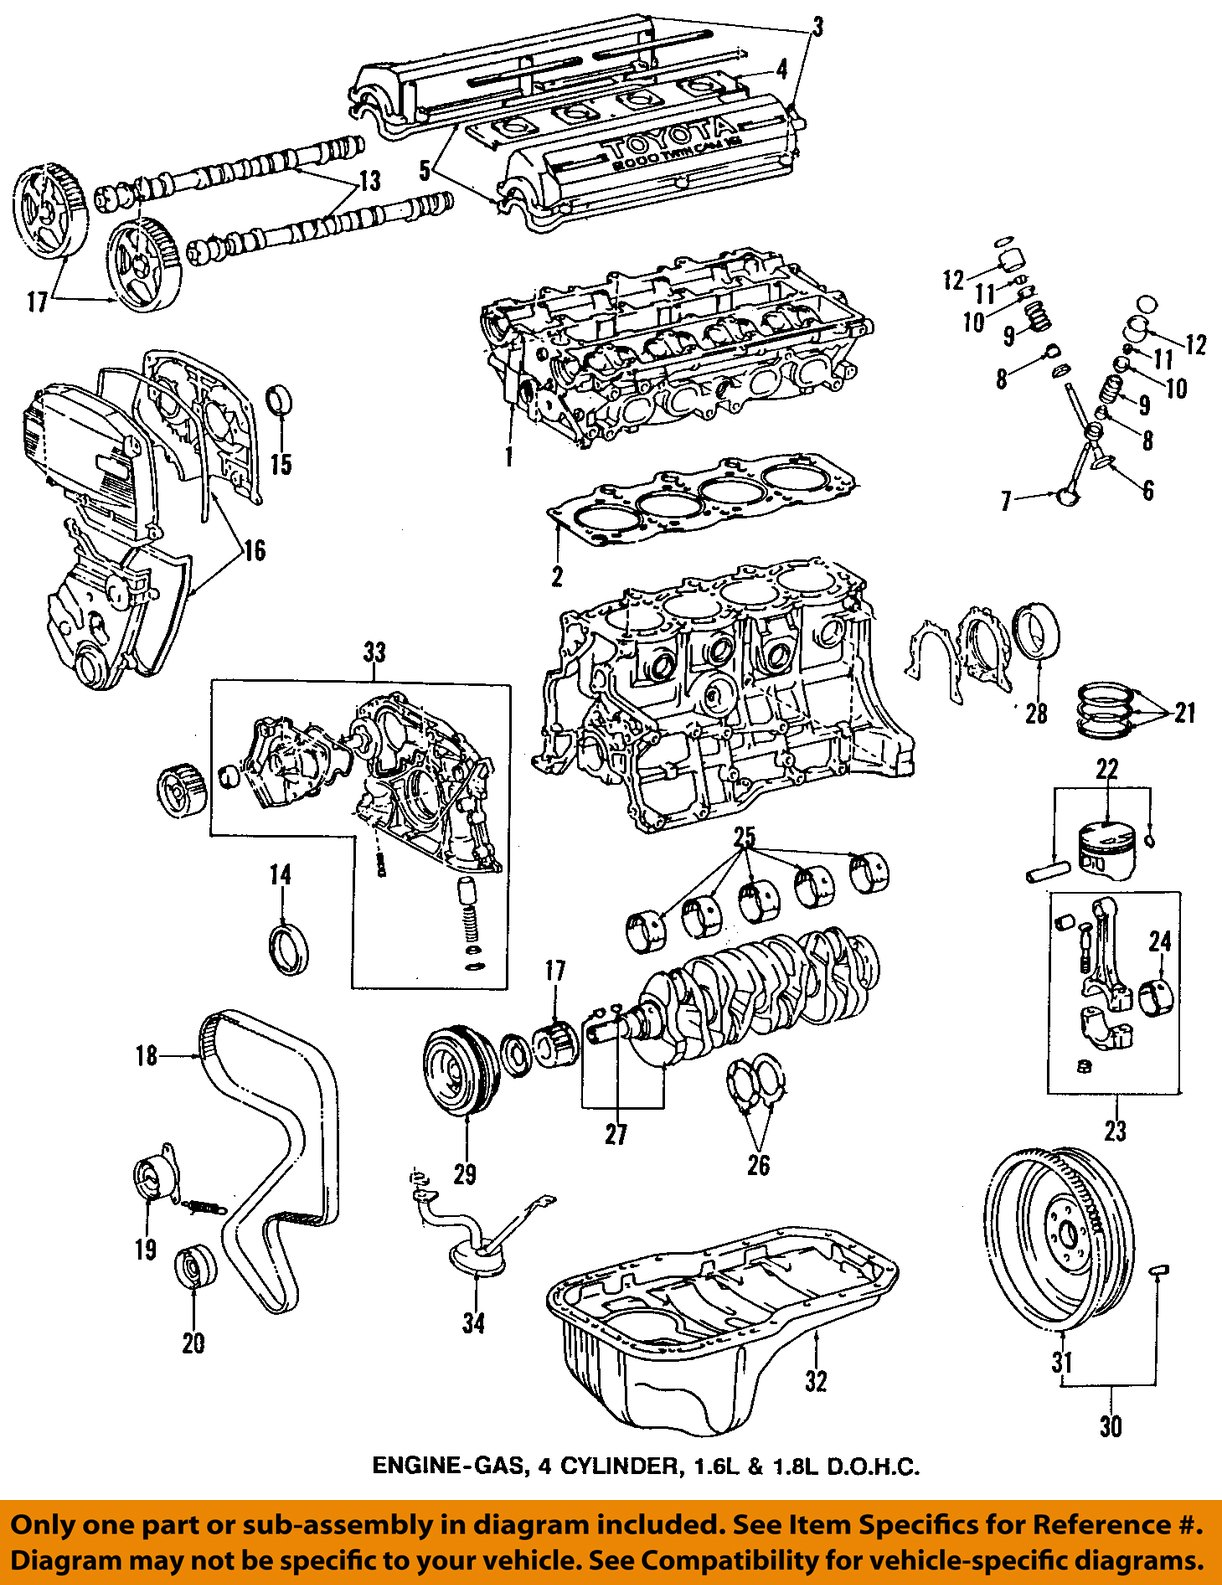 hight resolution of toyota oem 95 97 corolla engine timing gear sprocket toyota 22re engine diagram toyota 4runner engine